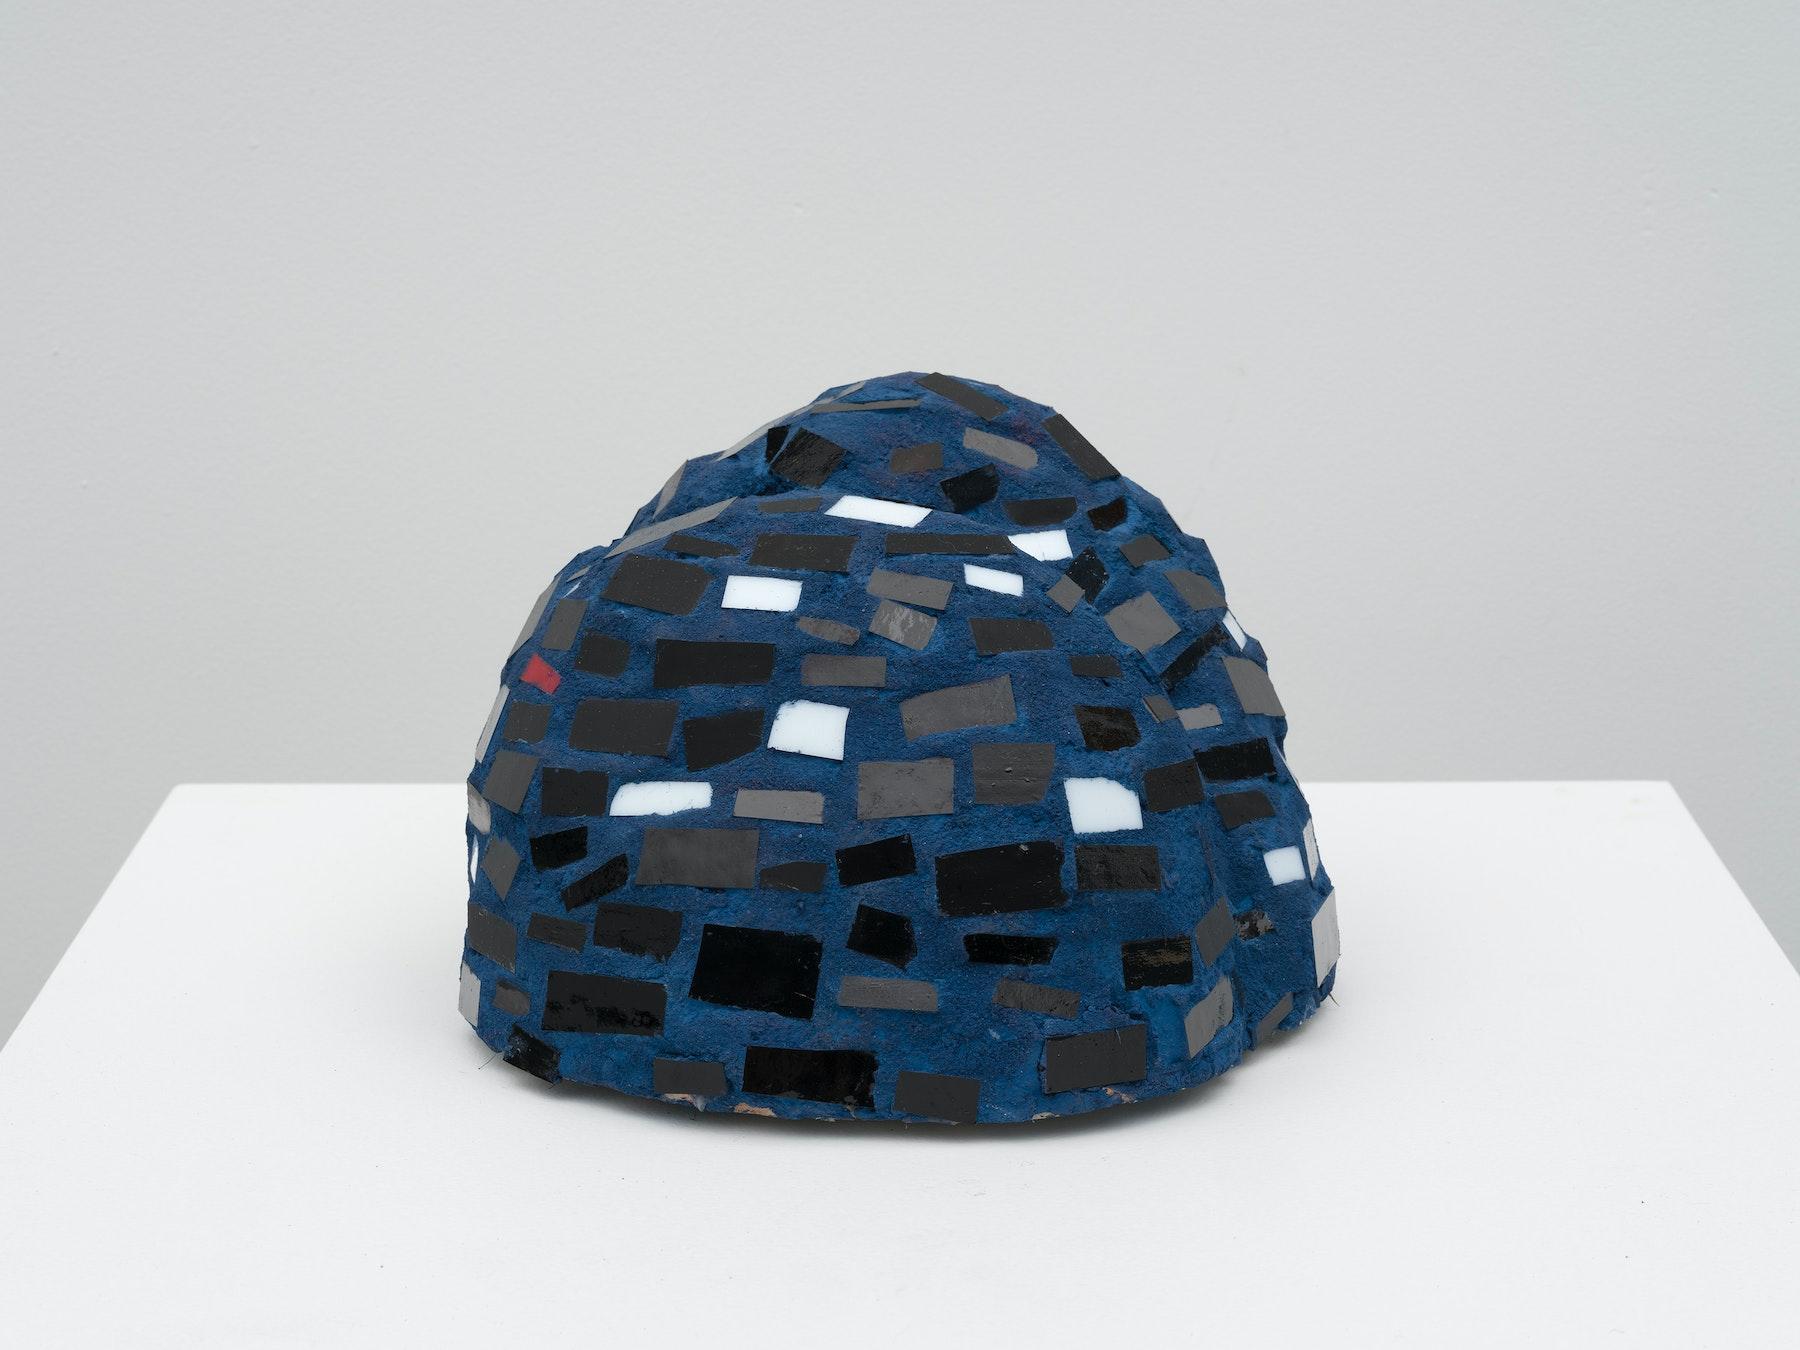 "Akina Cox ""Niki (Blue, Black, White),"" 2020 Glass, clay, grout, cement 6.75 x 8.75 x 9"" [HxWxD] (17.15 x 22.23 x 22.86 cm) Inventory #WS1046 Photo credit: Jeff Mclane"